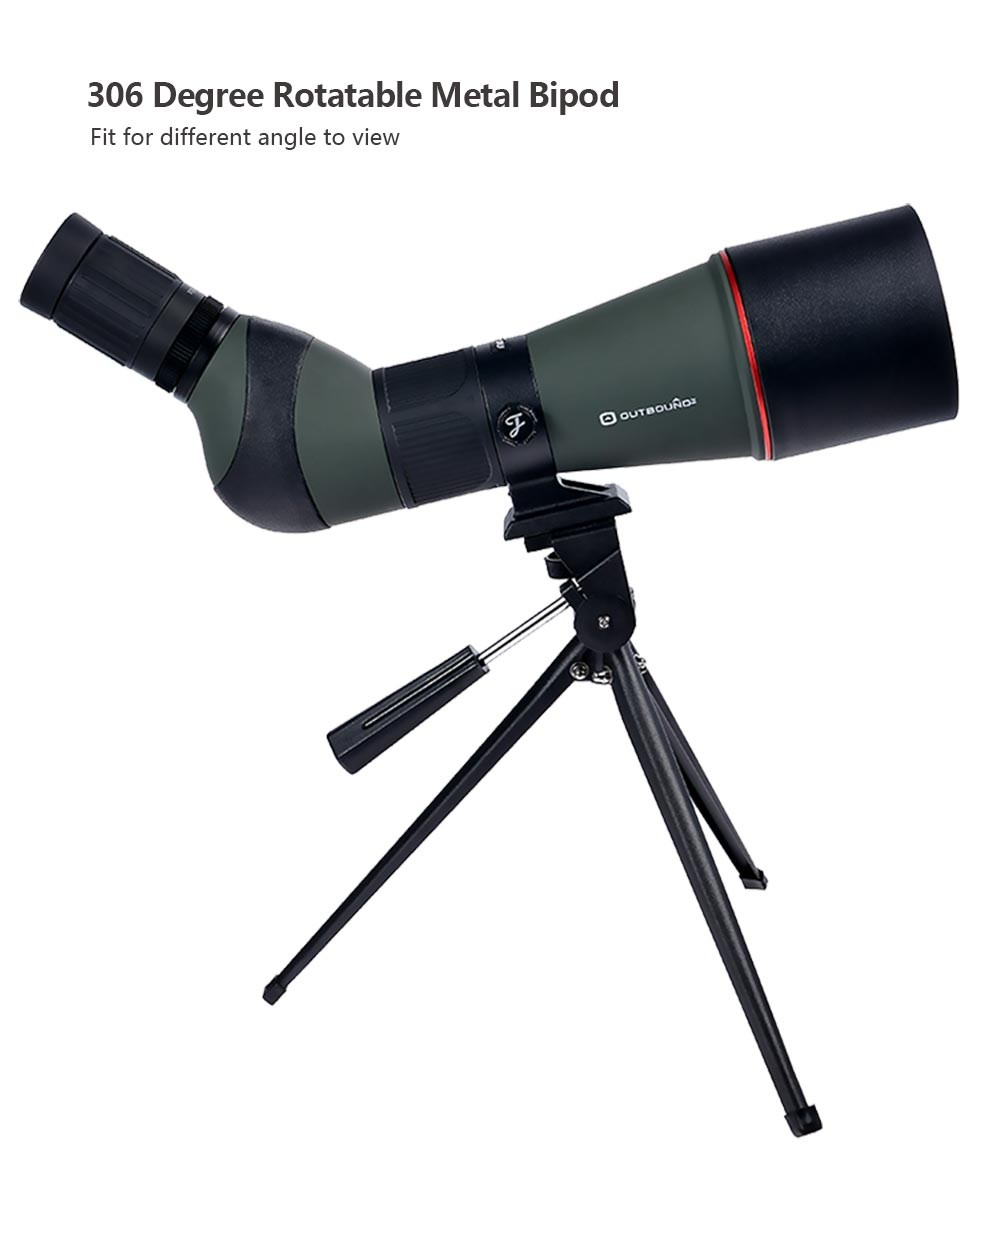 JouFou 20-60X80 HD Spotting Scope Waterproof Zoom Target Shooting Optical Glass High Power with Tripod Birdwatching (2)